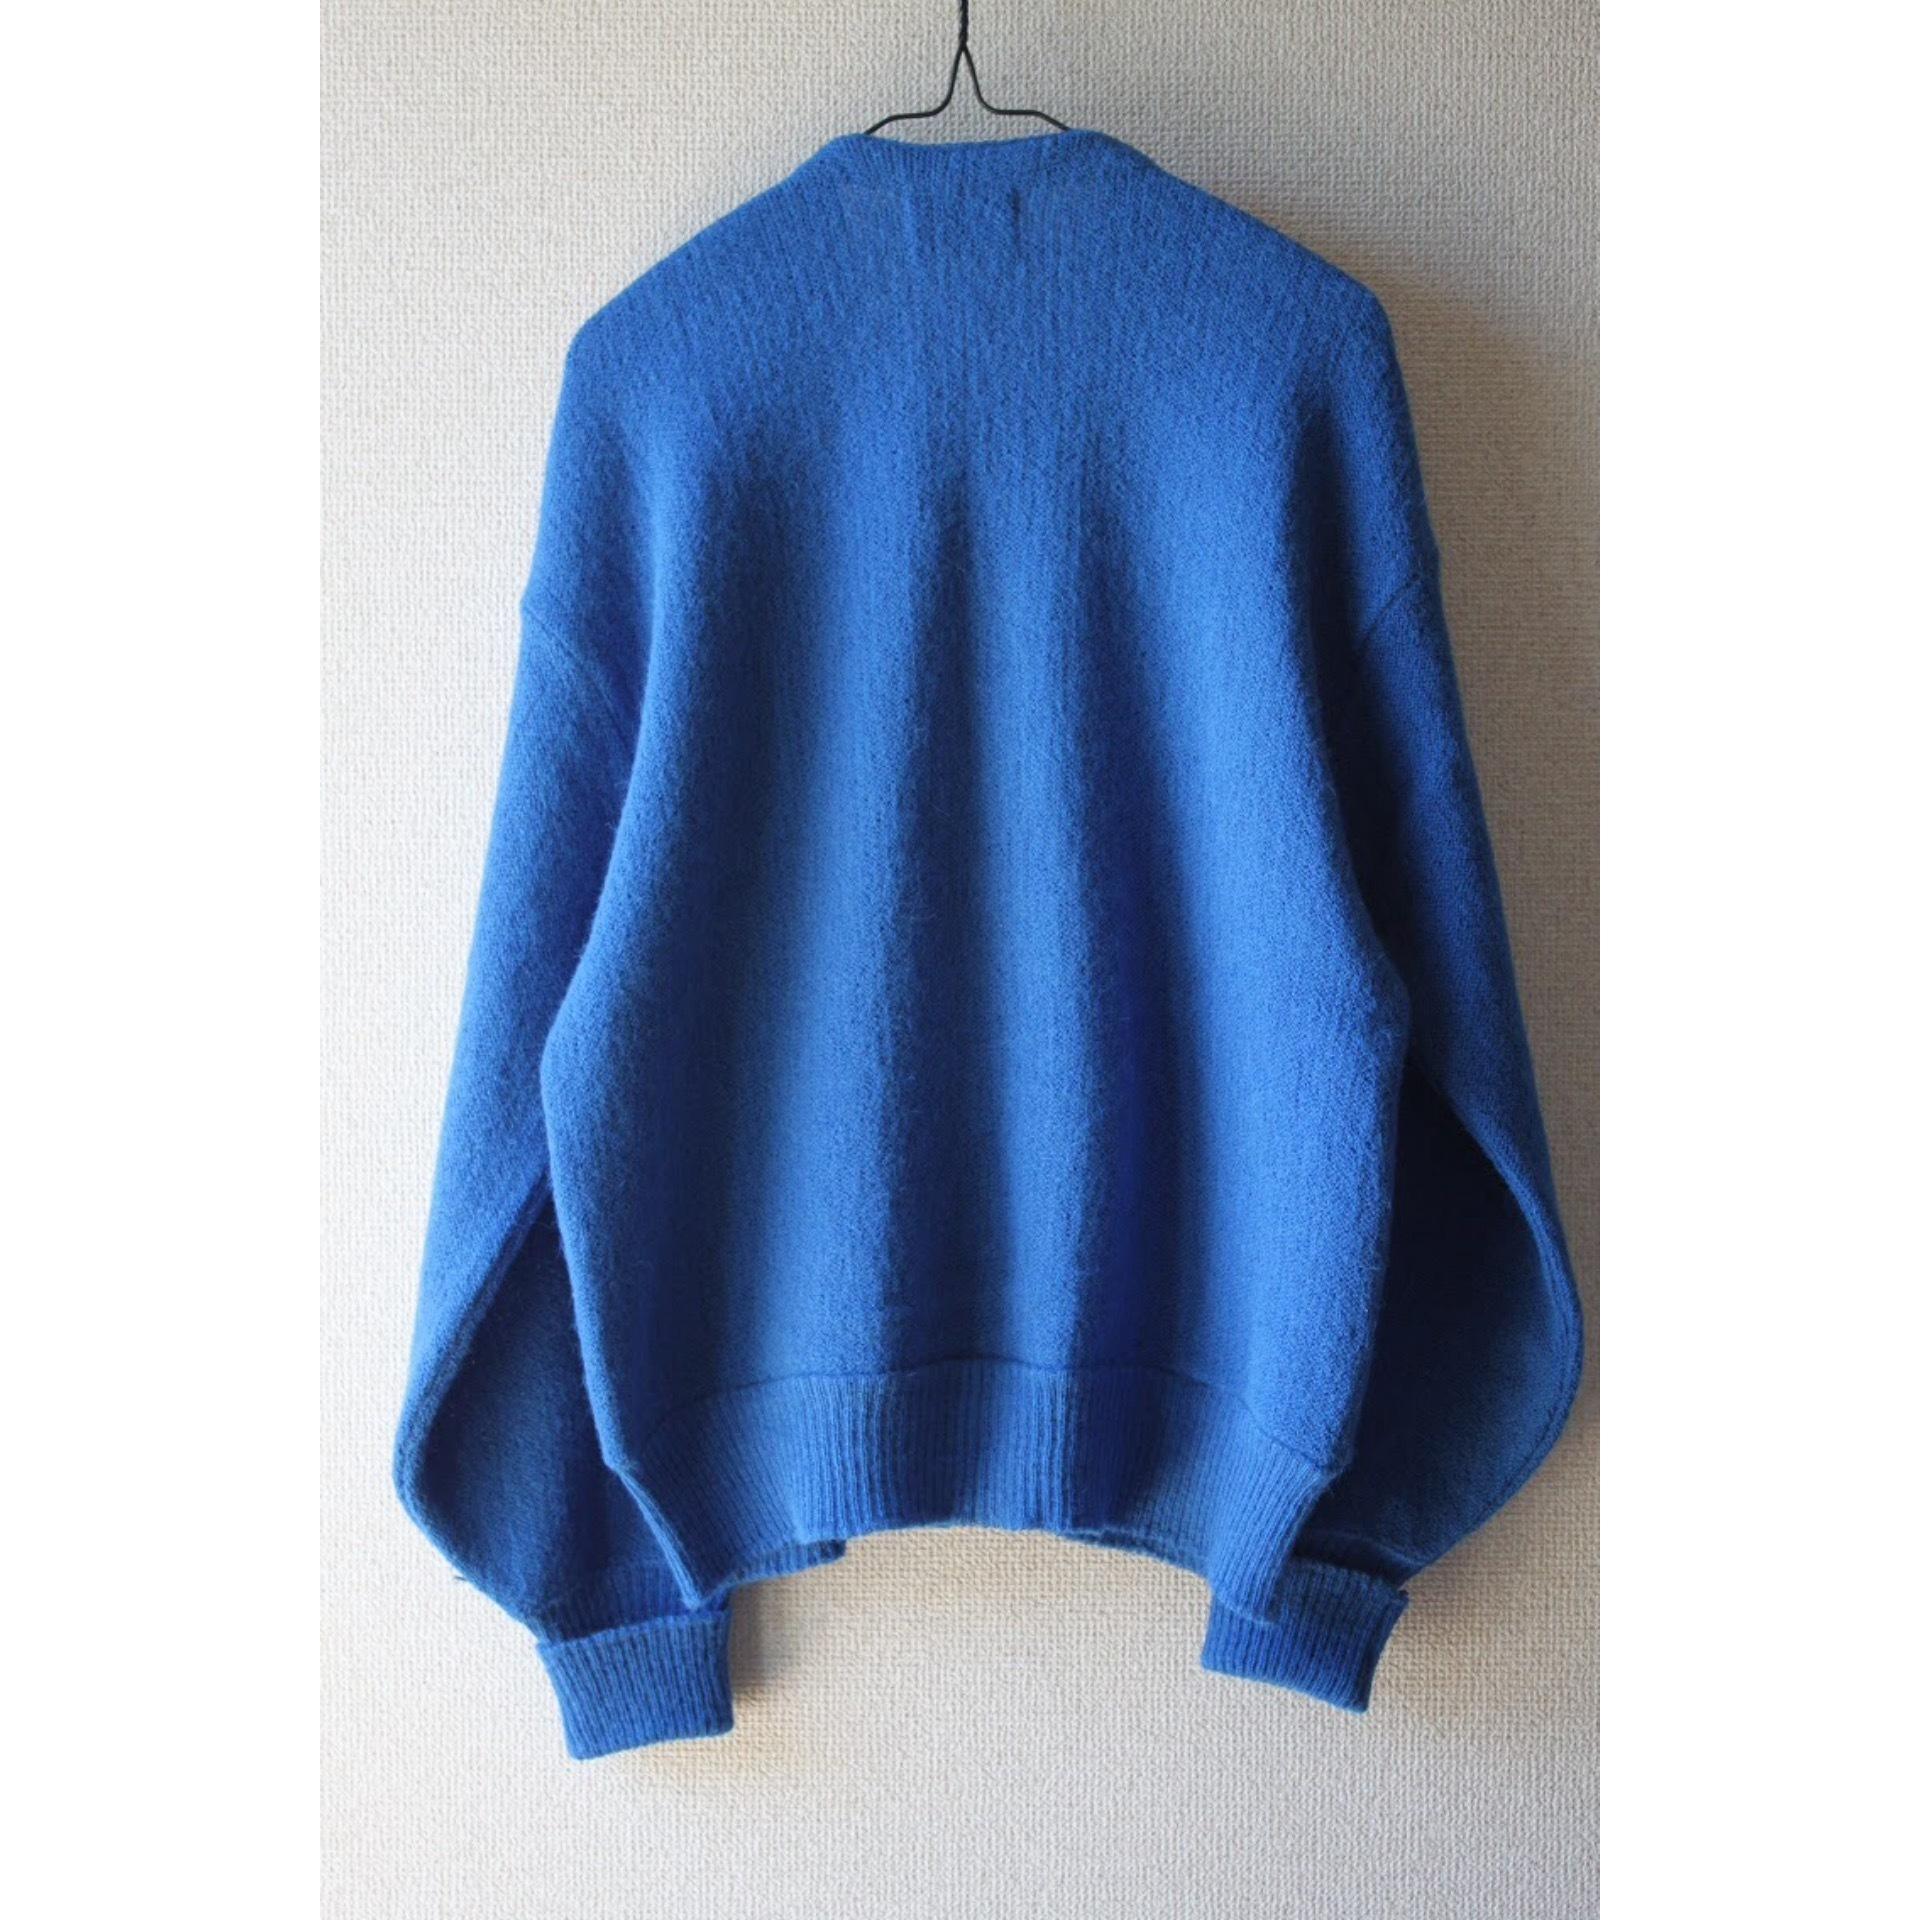 Vintage blue alpaca knit cardigan